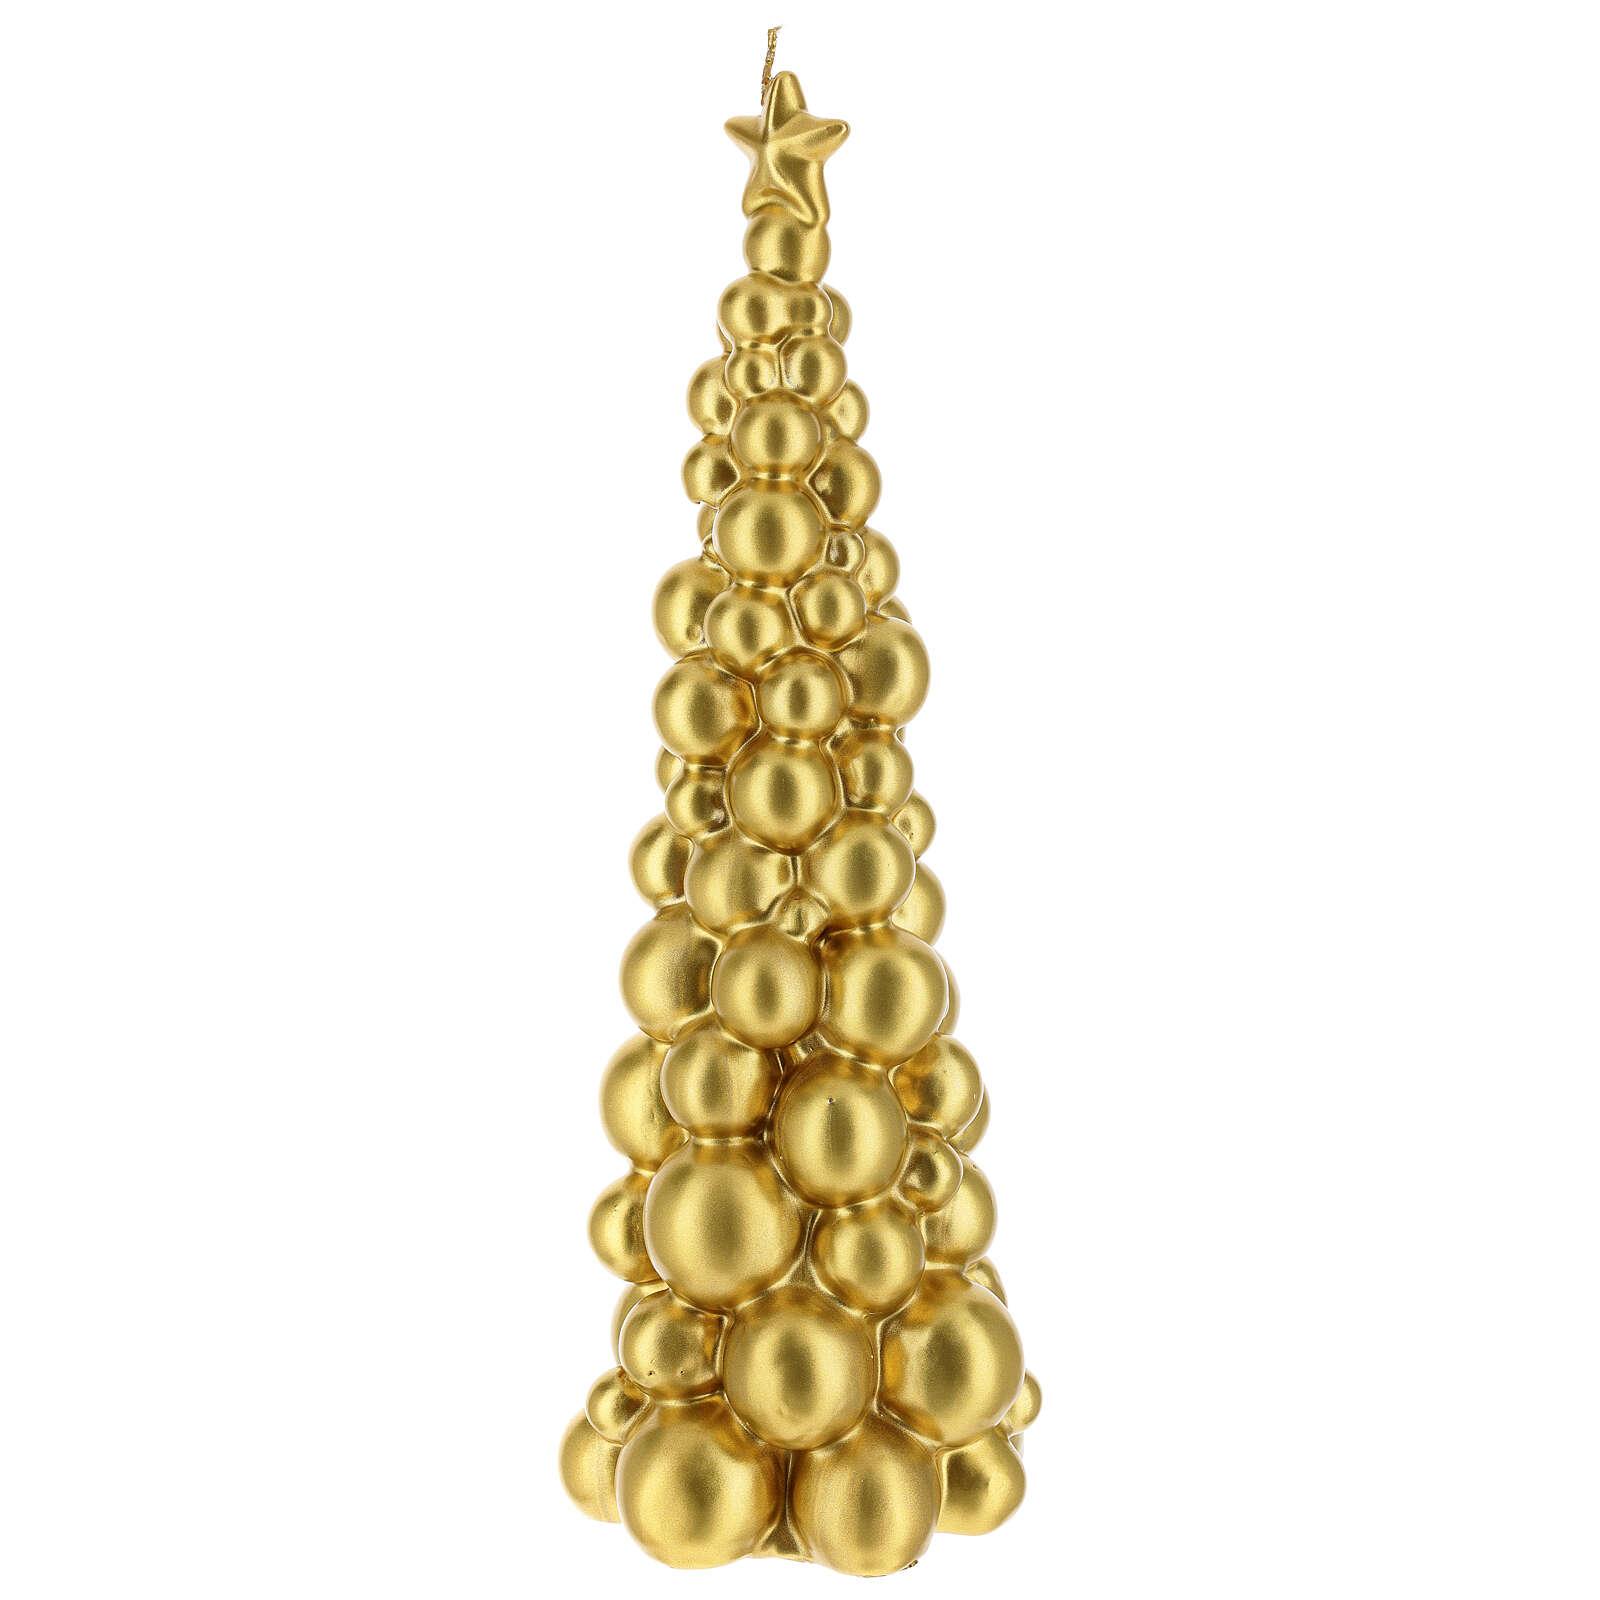 Bougie Moscou sapin de Noël or 30 cm 3